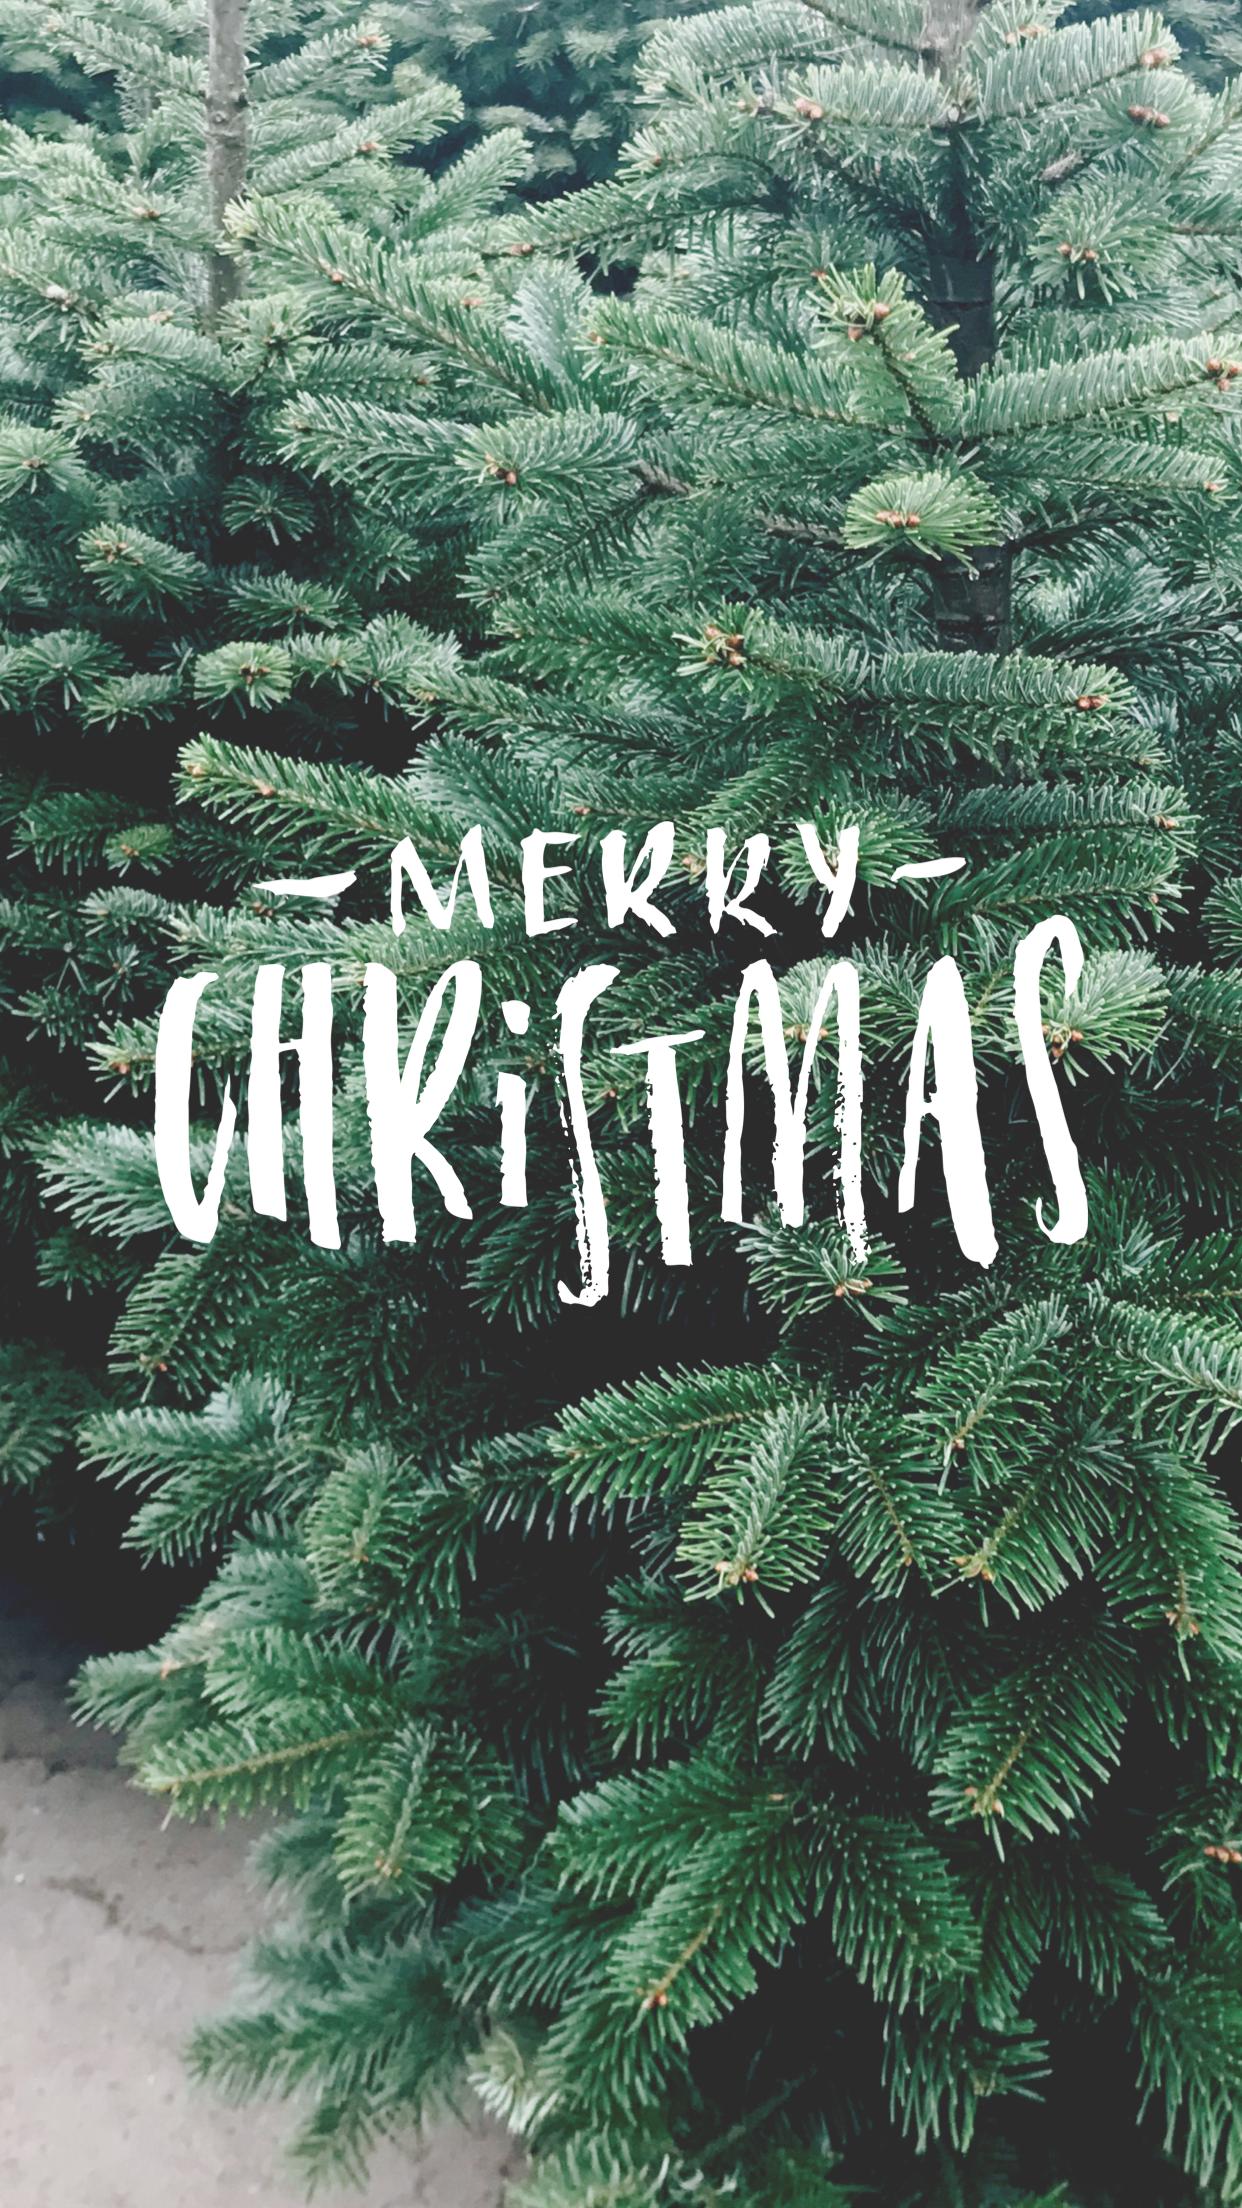 Merry Christmas Iphone Wallpaper Wallpaper Iphone Christmas Christmas Wallpaper Iphone Tumblr Merry Christmas Wallpaper